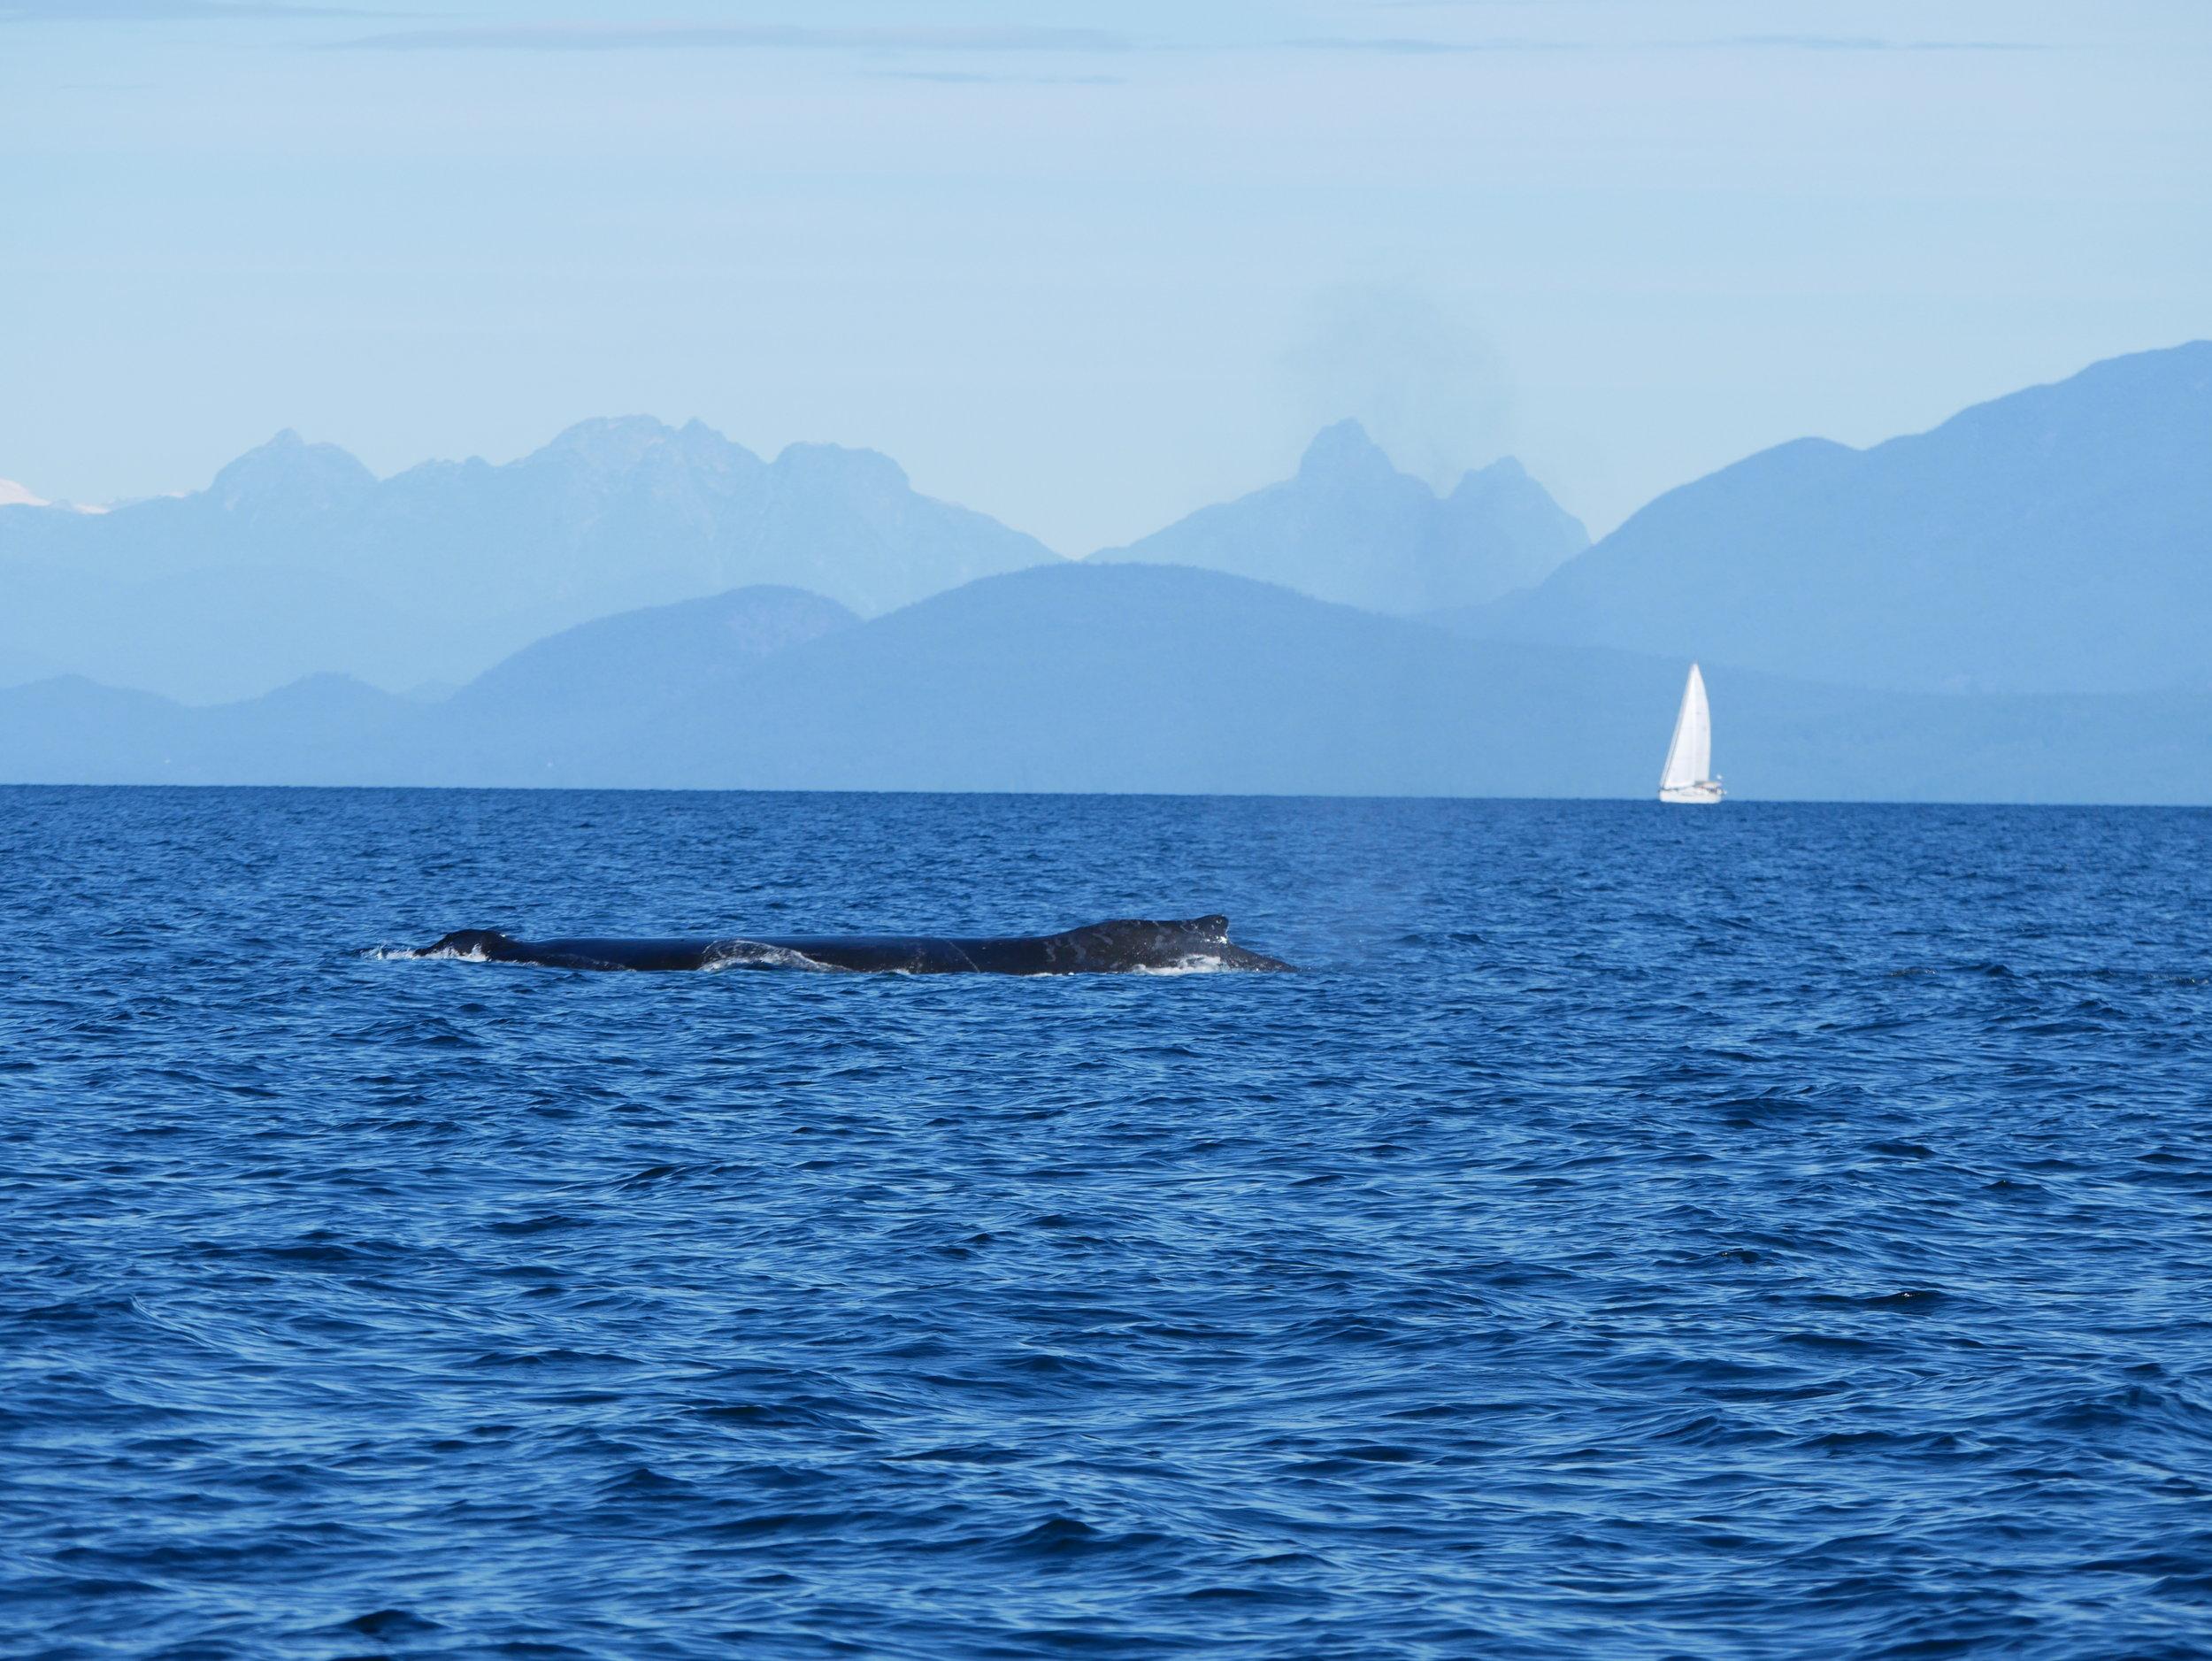 North shore mountains and a large humpback whale! Photo by Rodrigo Menezes